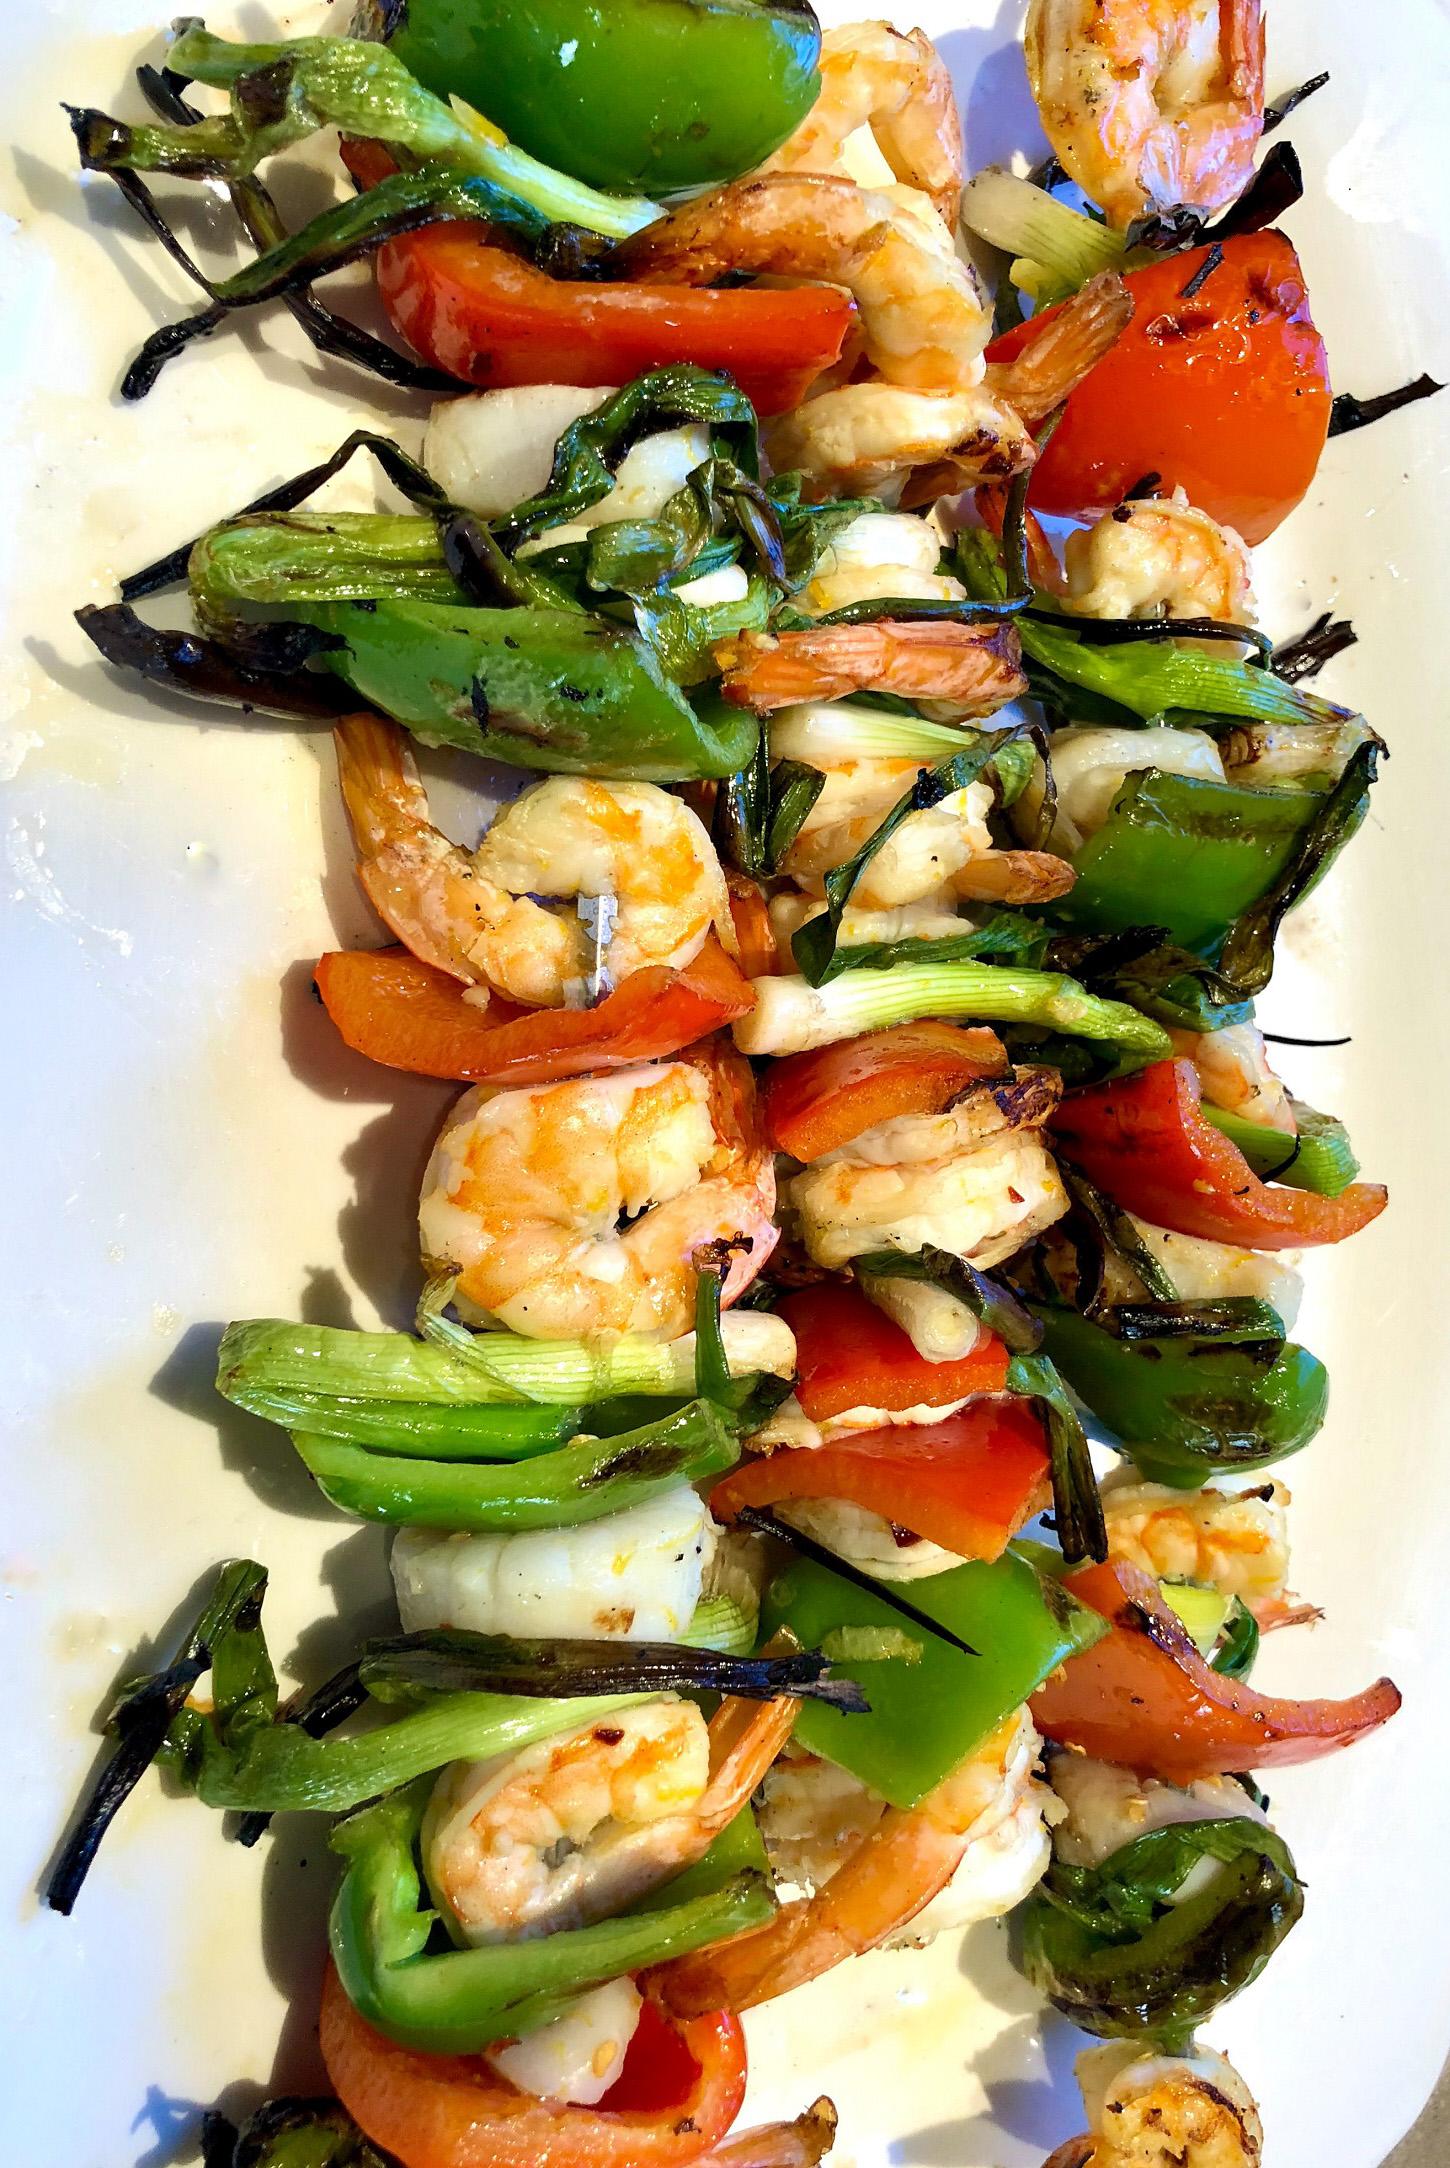 Cindy's Grilled Shrimp and Scallop Kebobs